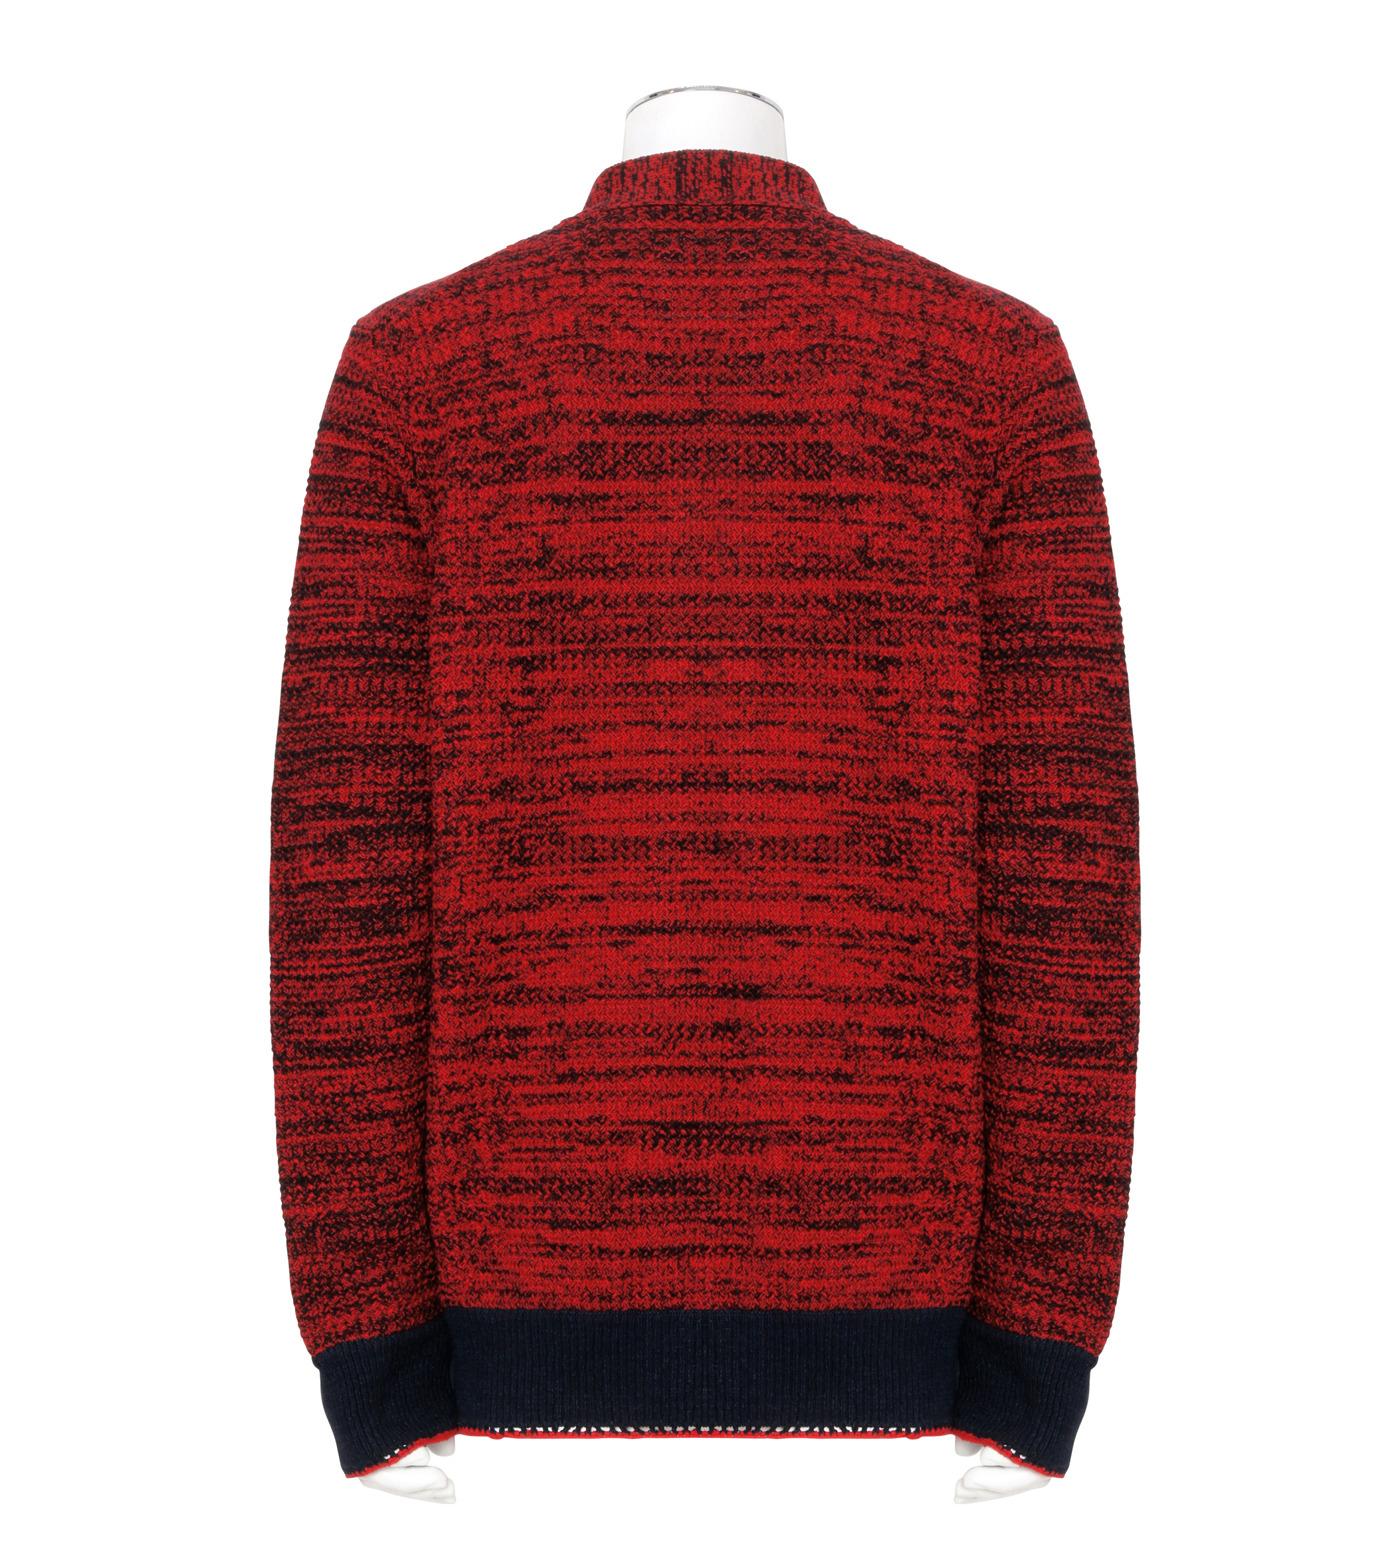 Sacai(サカイ)のKnit Cardigan-RED(ニット/knit)-17-01243M-62 拡大詳細画像2